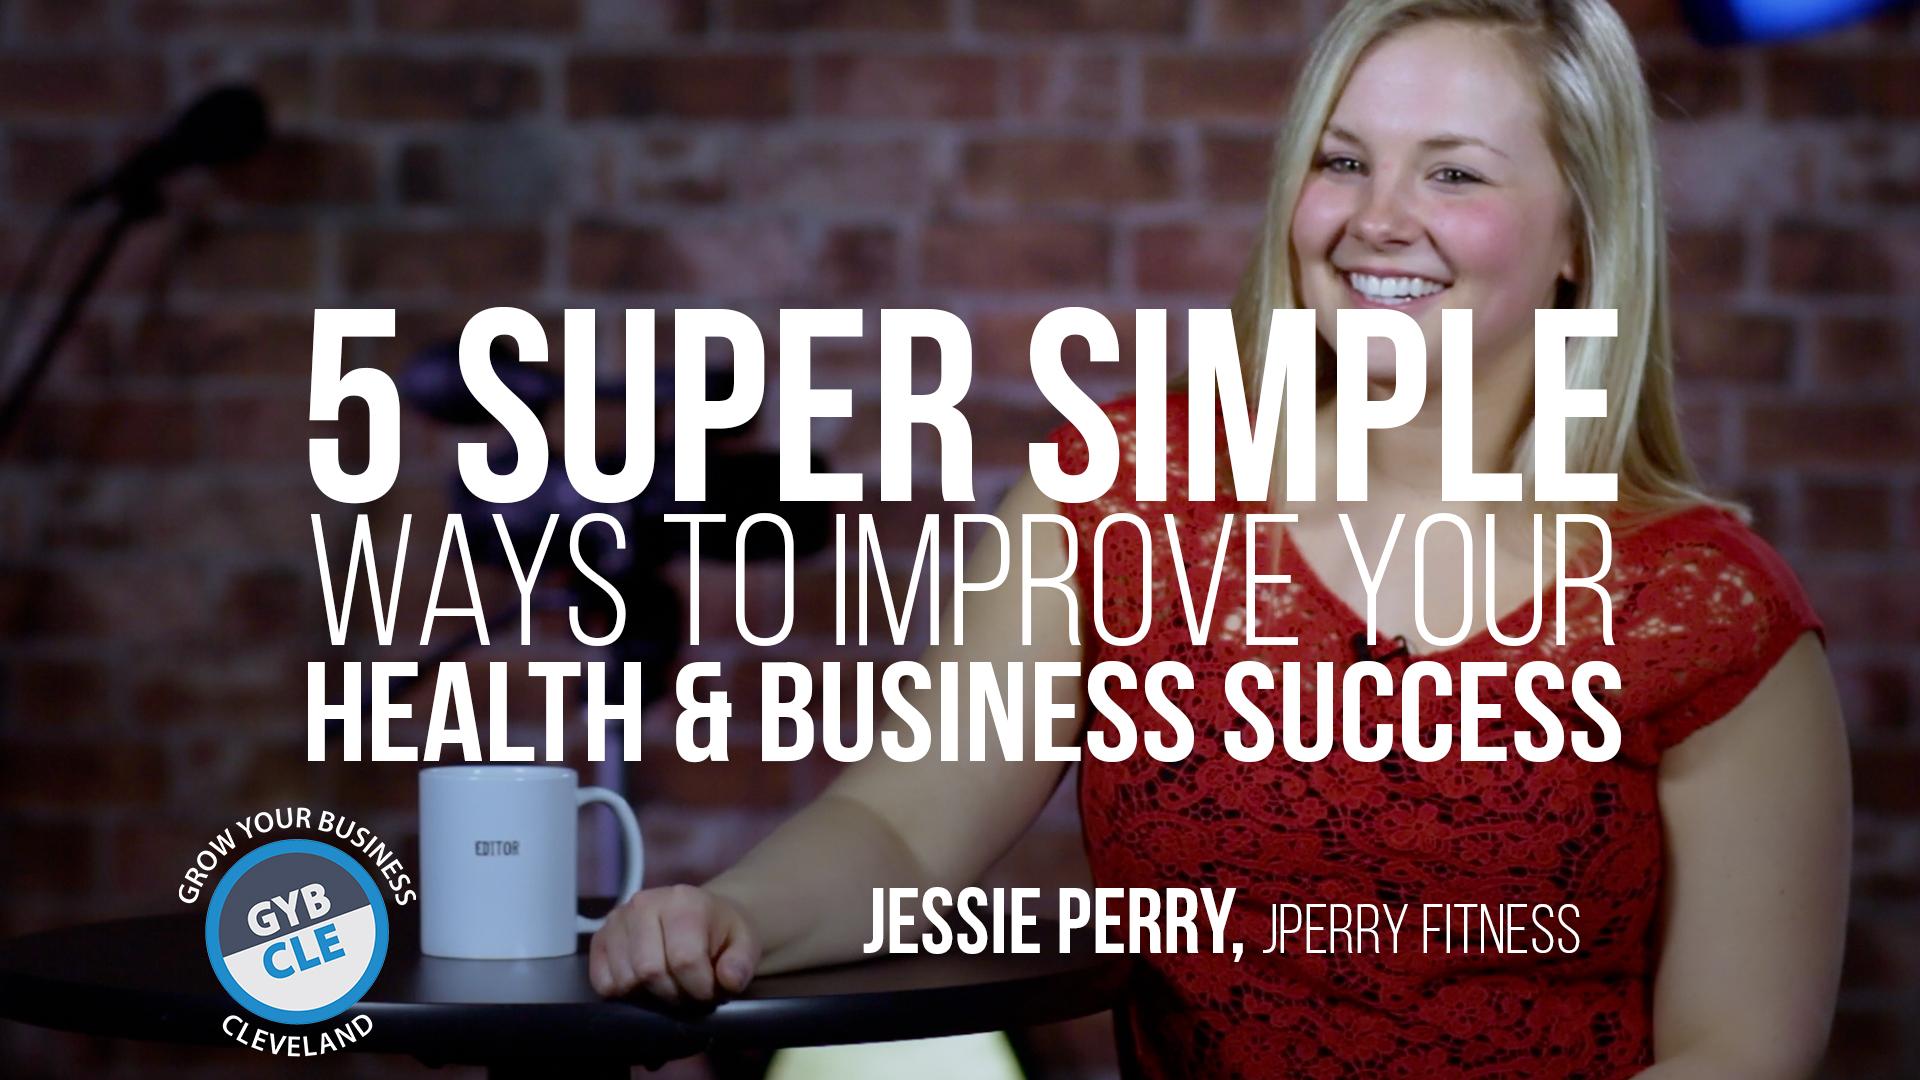 Jessie Perry